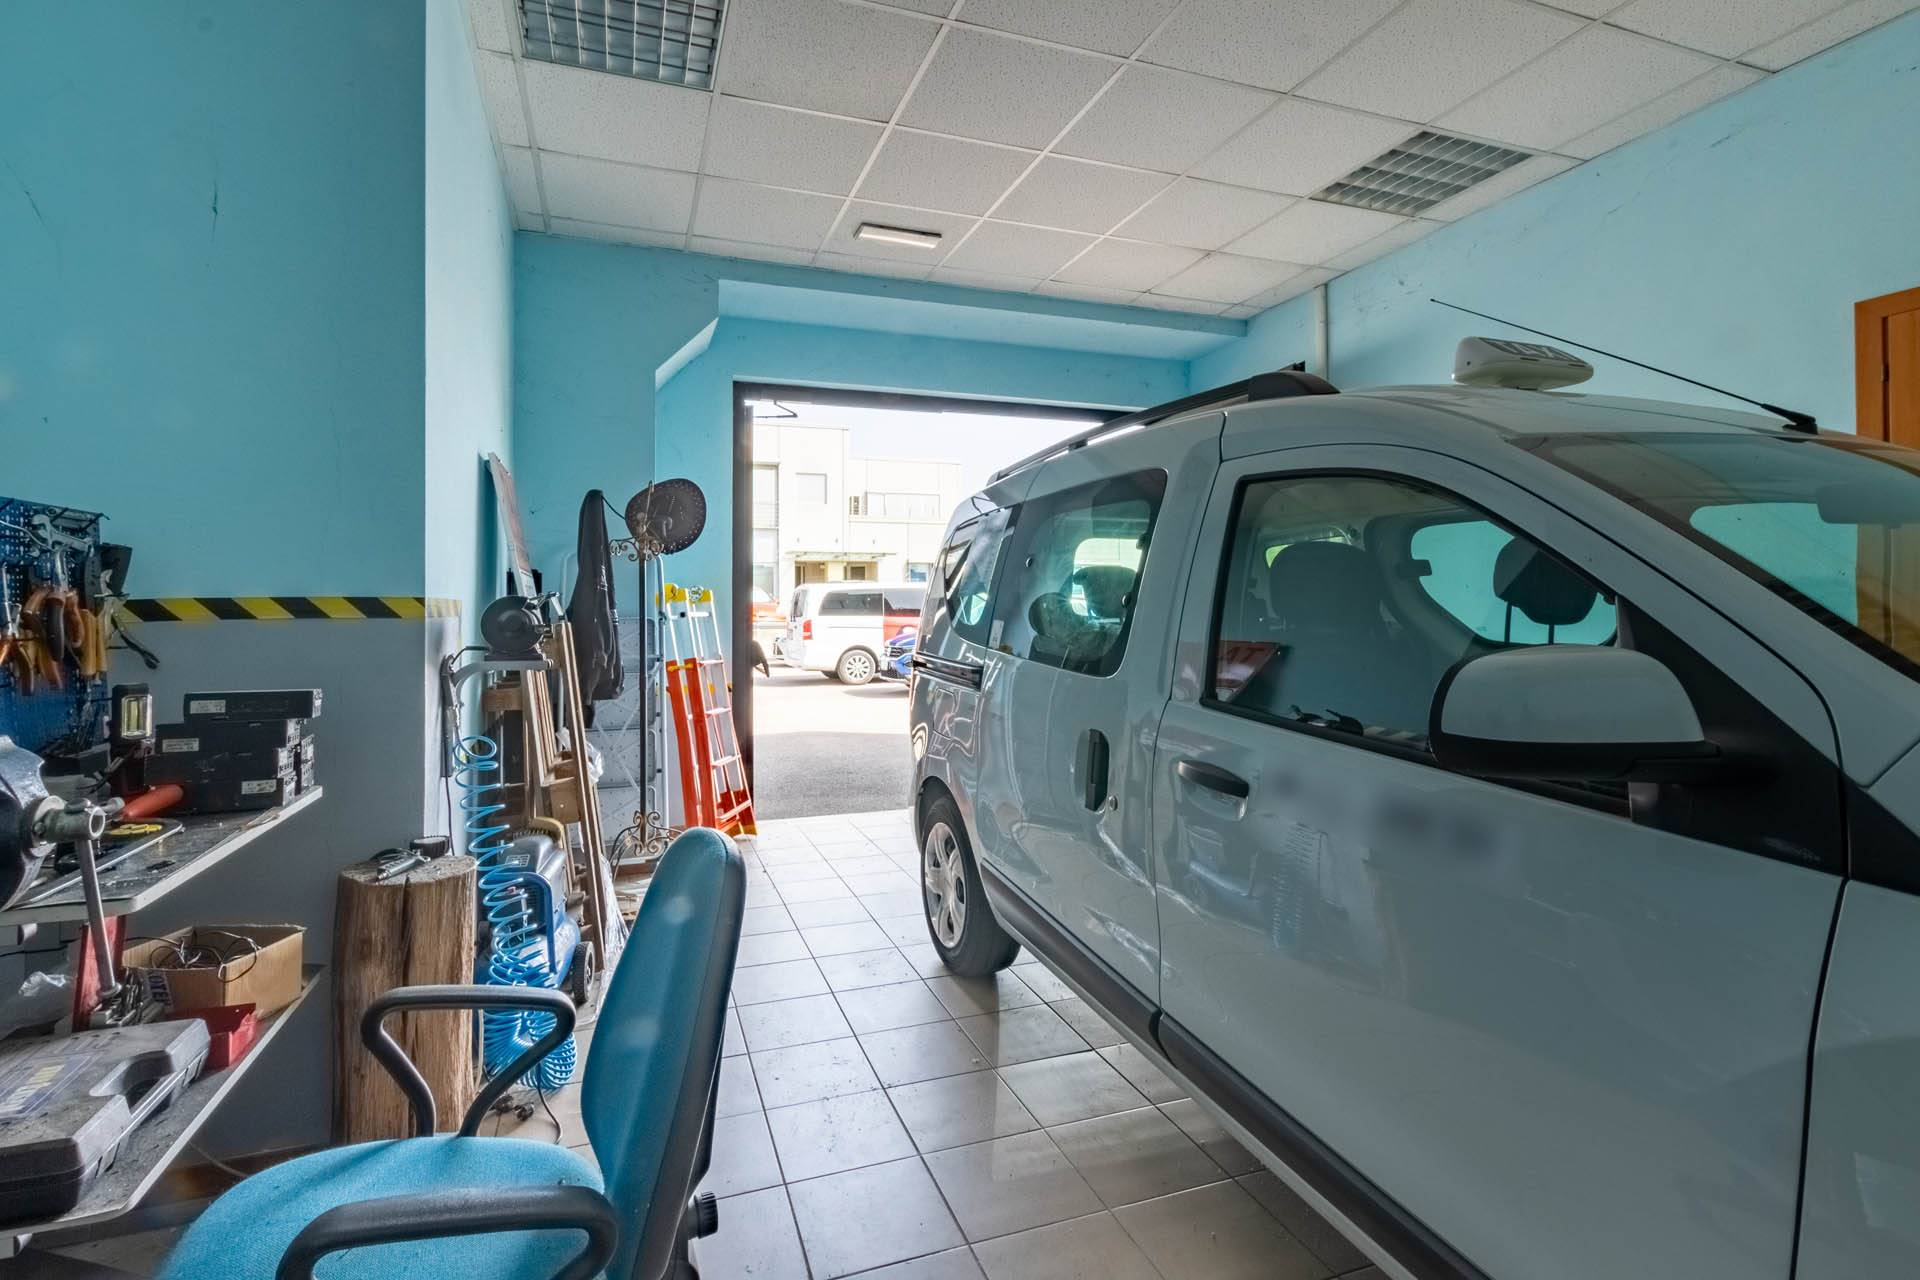 Ufficio/garage